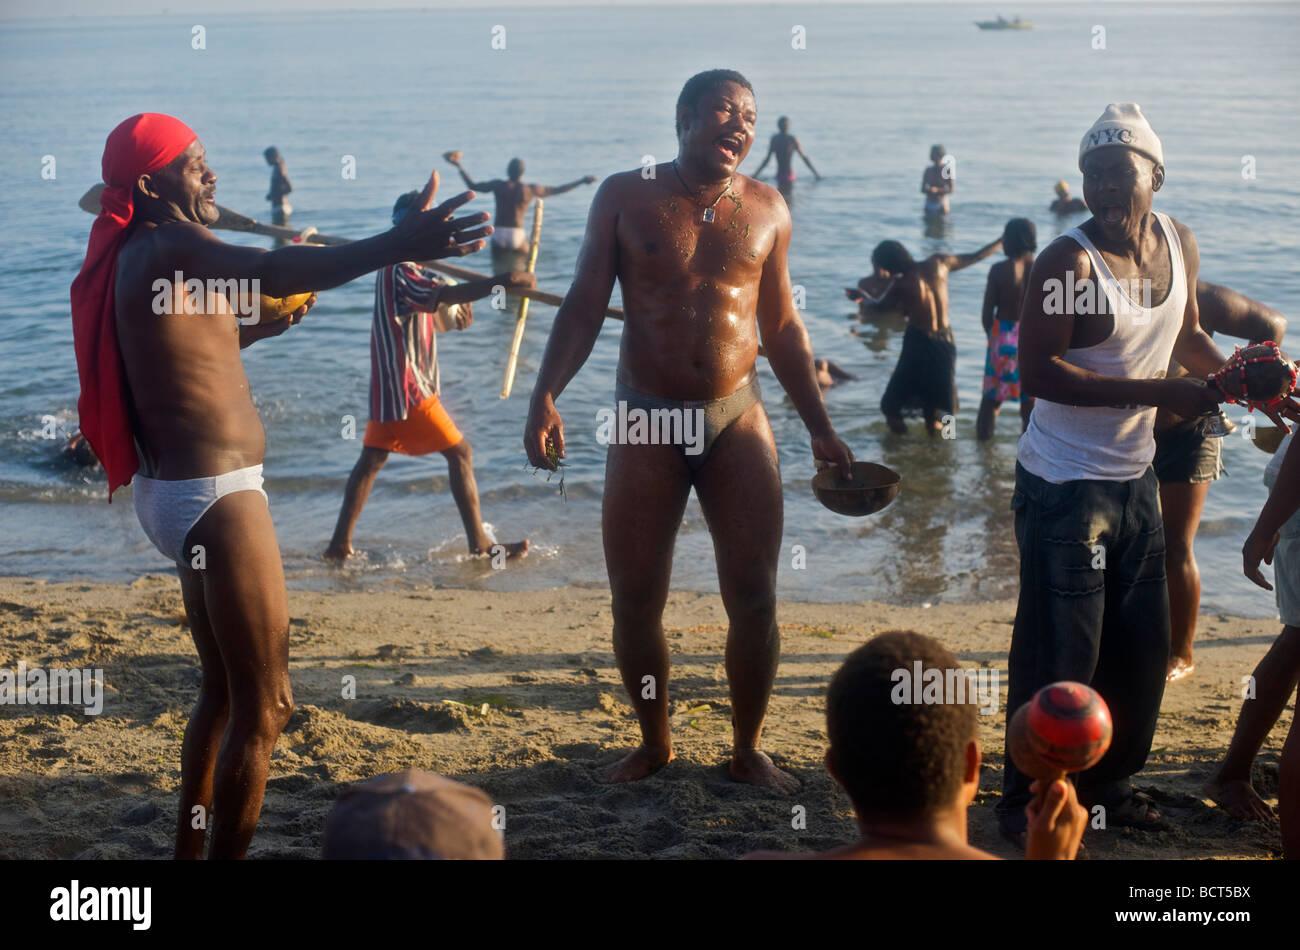 Image Bord De Mer voodoo worshipers dance at bord de mer de limonade, on the